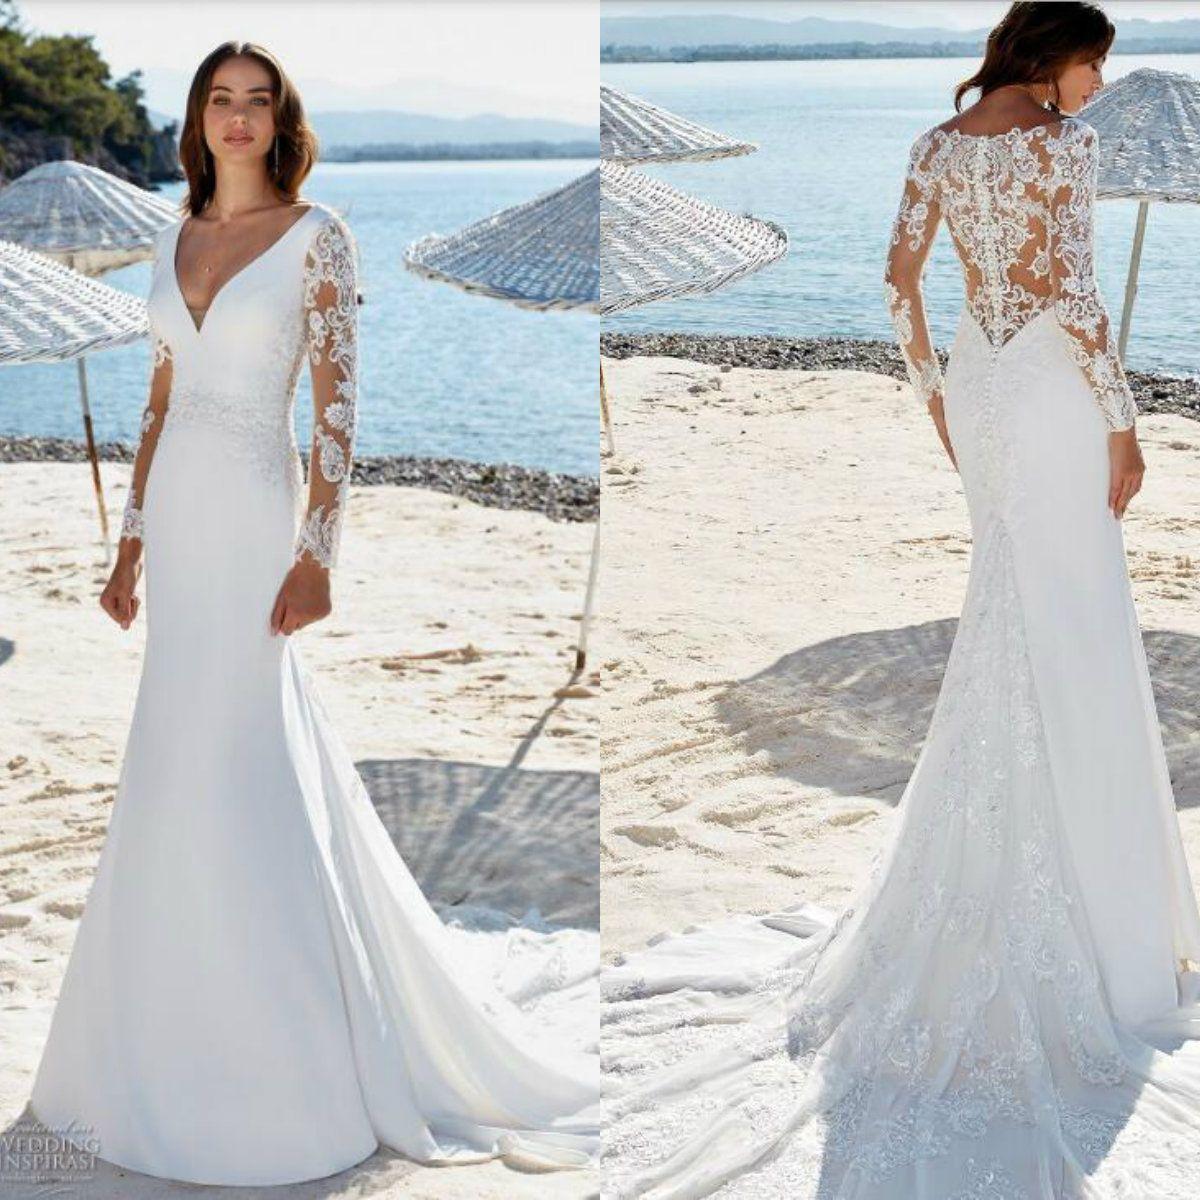 b4c335e5043e Eddy K. Dreams 2019 Wedding Dress V Neck Lace Long Sleeves Sequins  Appliques Beach Wedding Dresses Vestios Beautiful Wedding Dress Bridal  Designers From ...